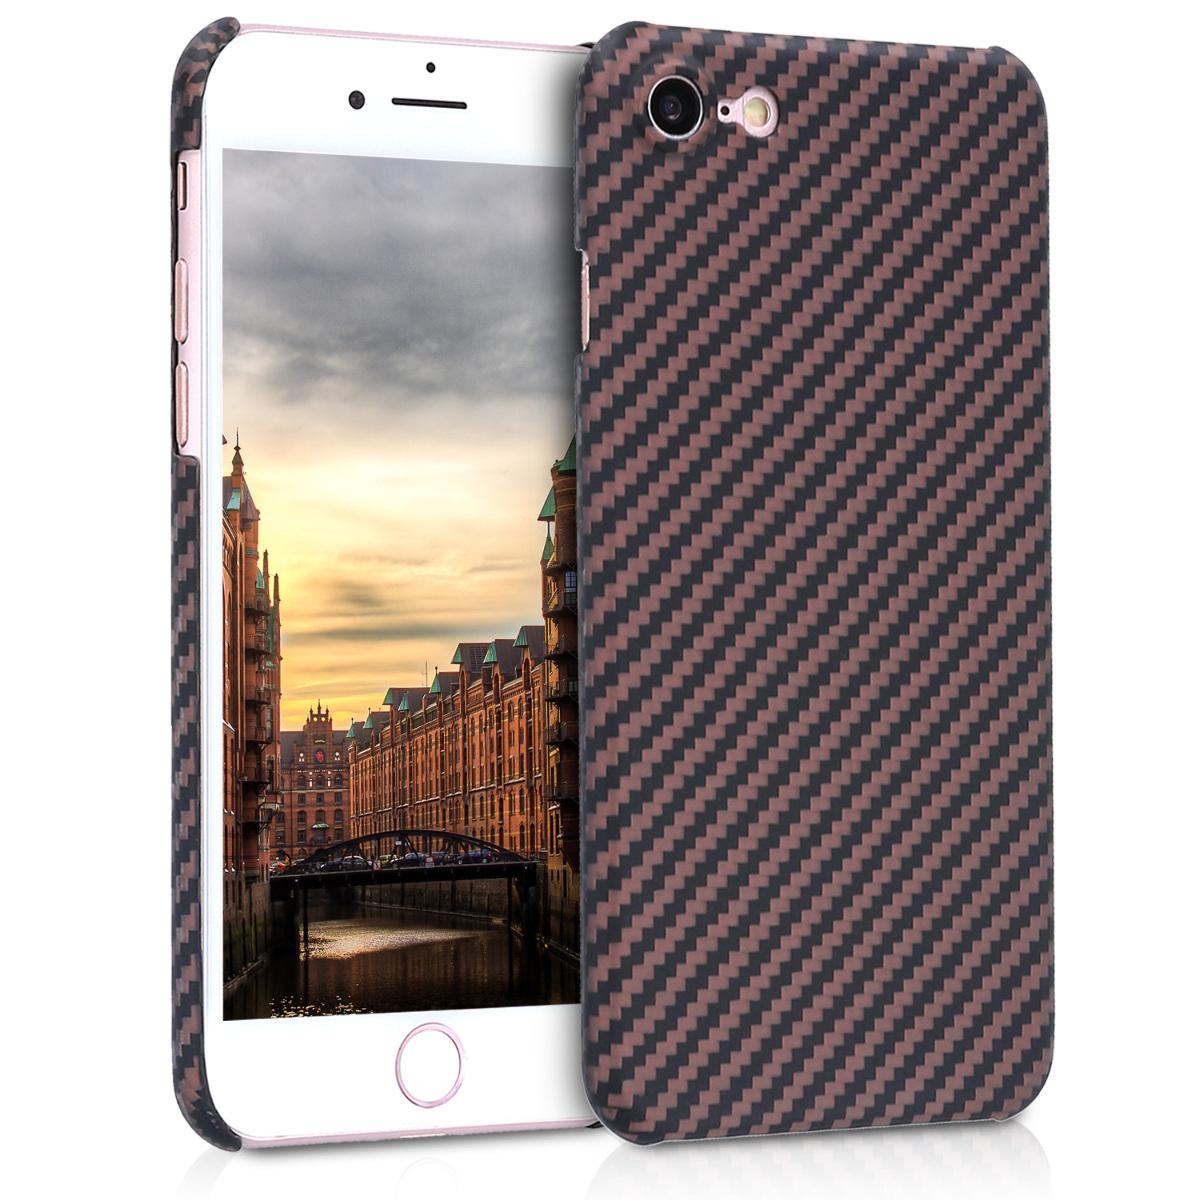 Kalibri Aramid Fiber Body - Σκληρή Θήκη iPhone 8 / 7 - Beige / Black Matte (42082.96)